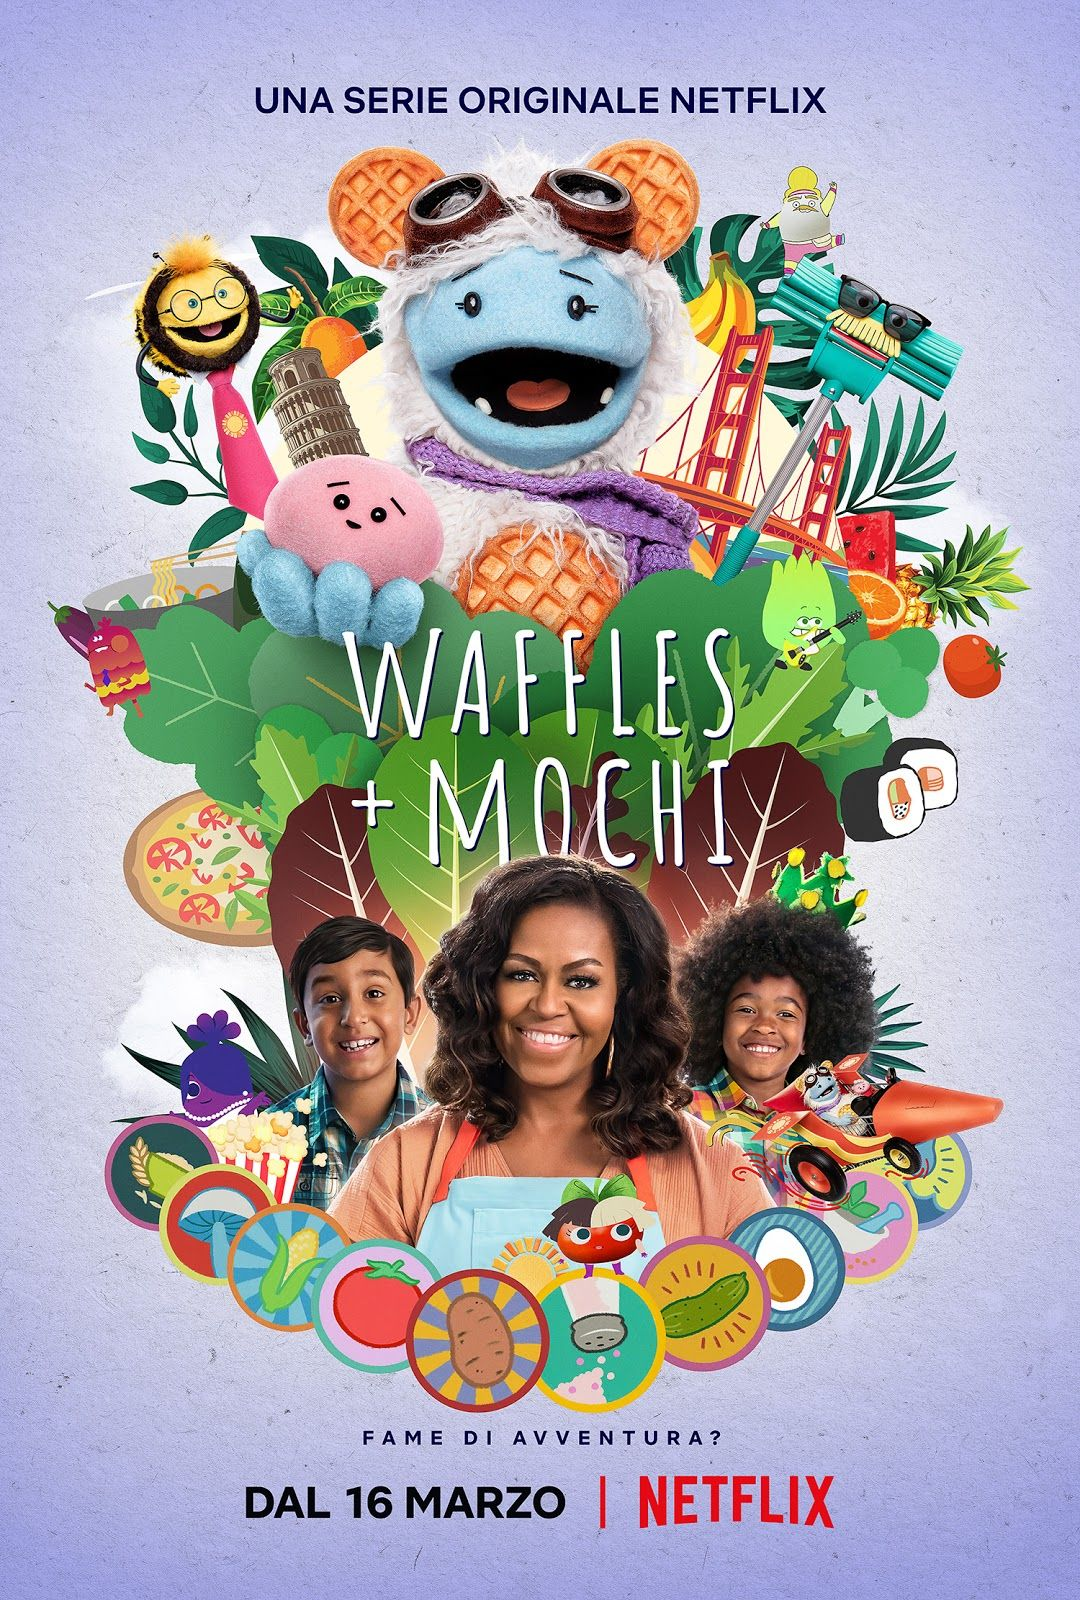 Waffles + Mochi su Netflix: uscita, trama e dichiarazioni